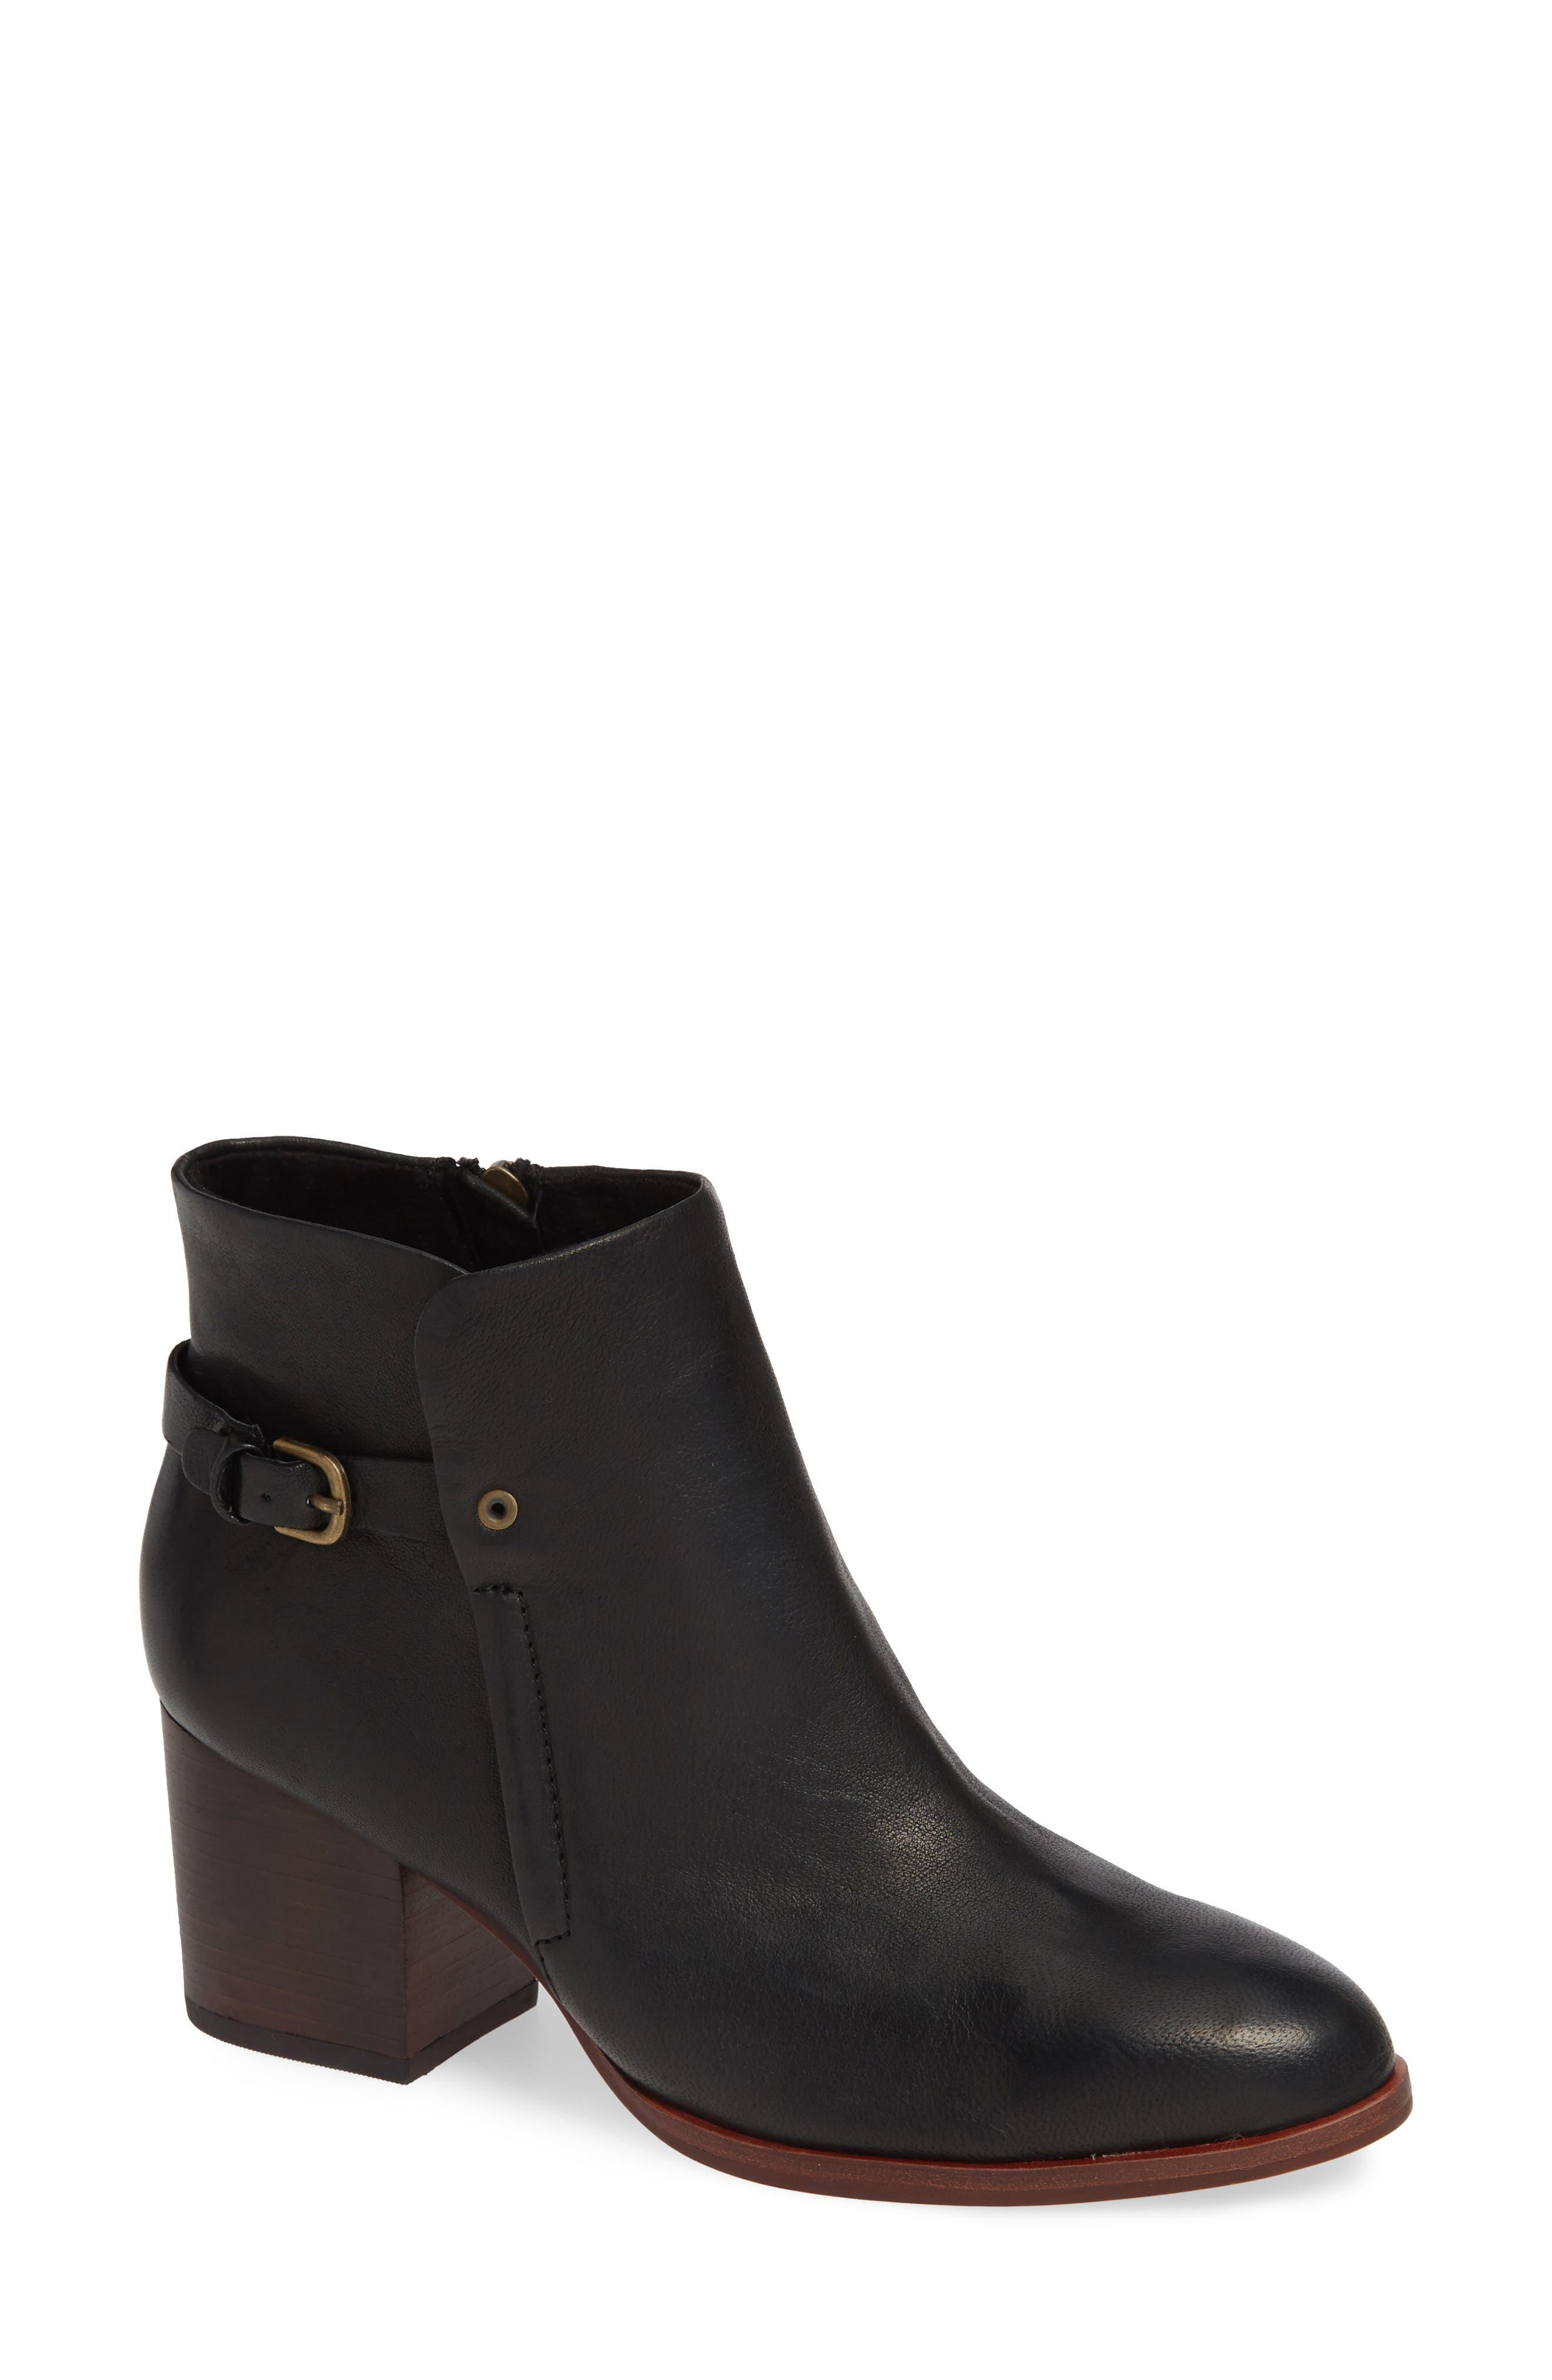 Orlinda Block Heel Bootie, Main, color, BLACK LEATHER